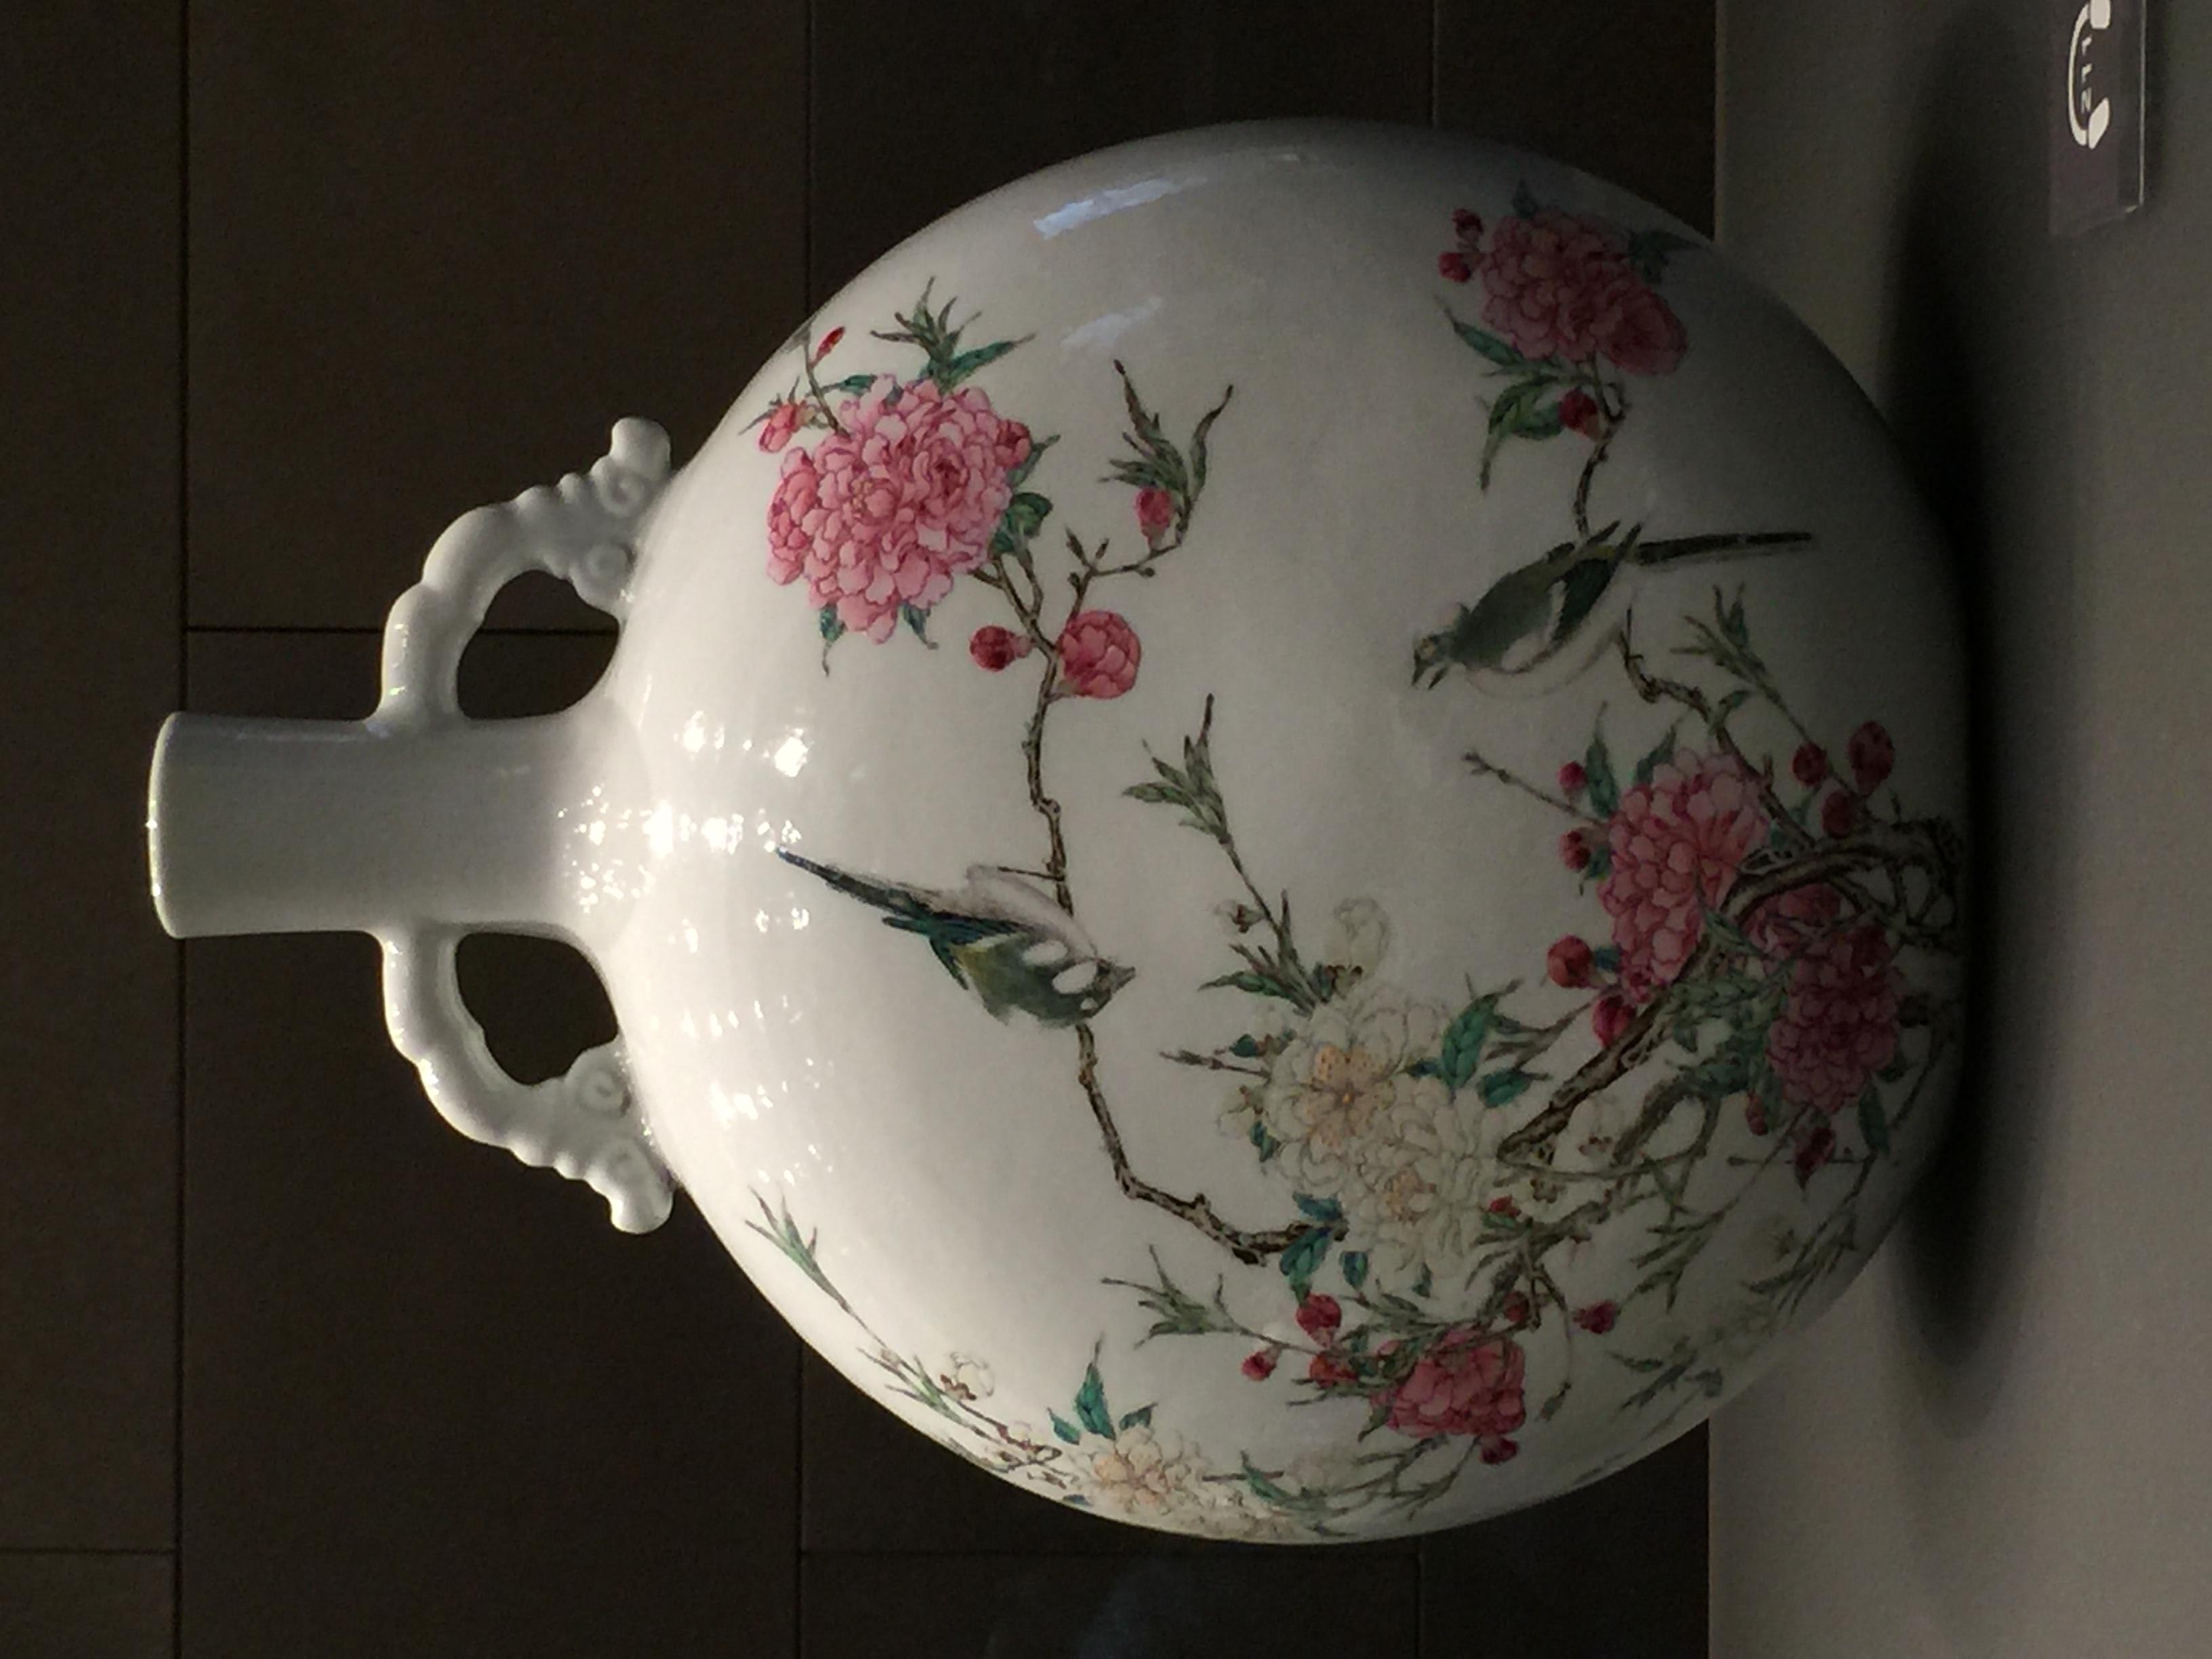 Chinese-Porcelain-British-Museum-Percival-David-jessewaugh.com-107.jpg